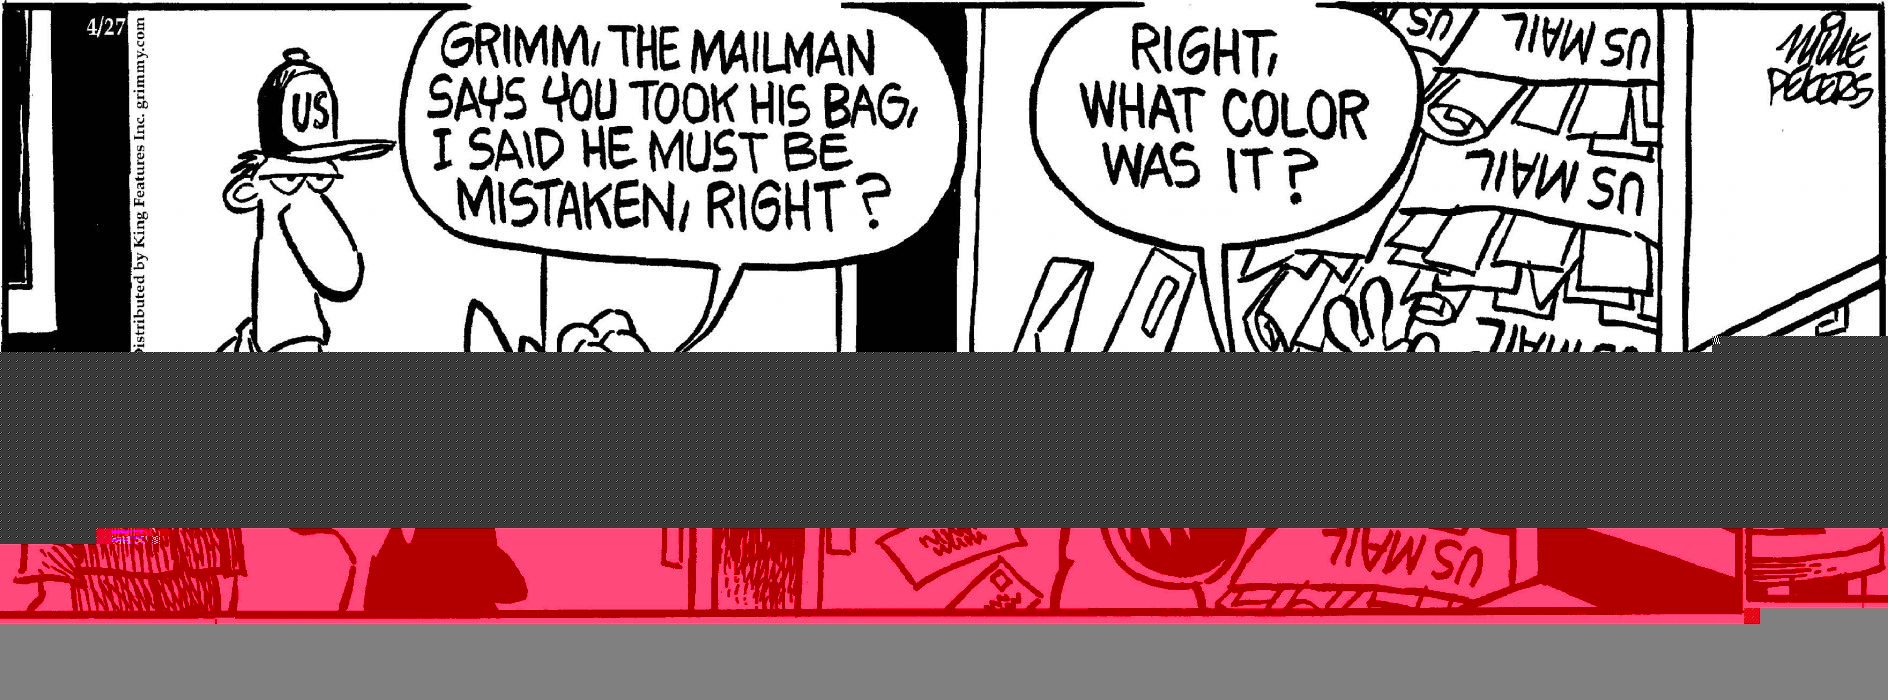 MOTHER-GOOSE-AND-GRIM mother goose grim funny humor comicstrip (4) wallpaper